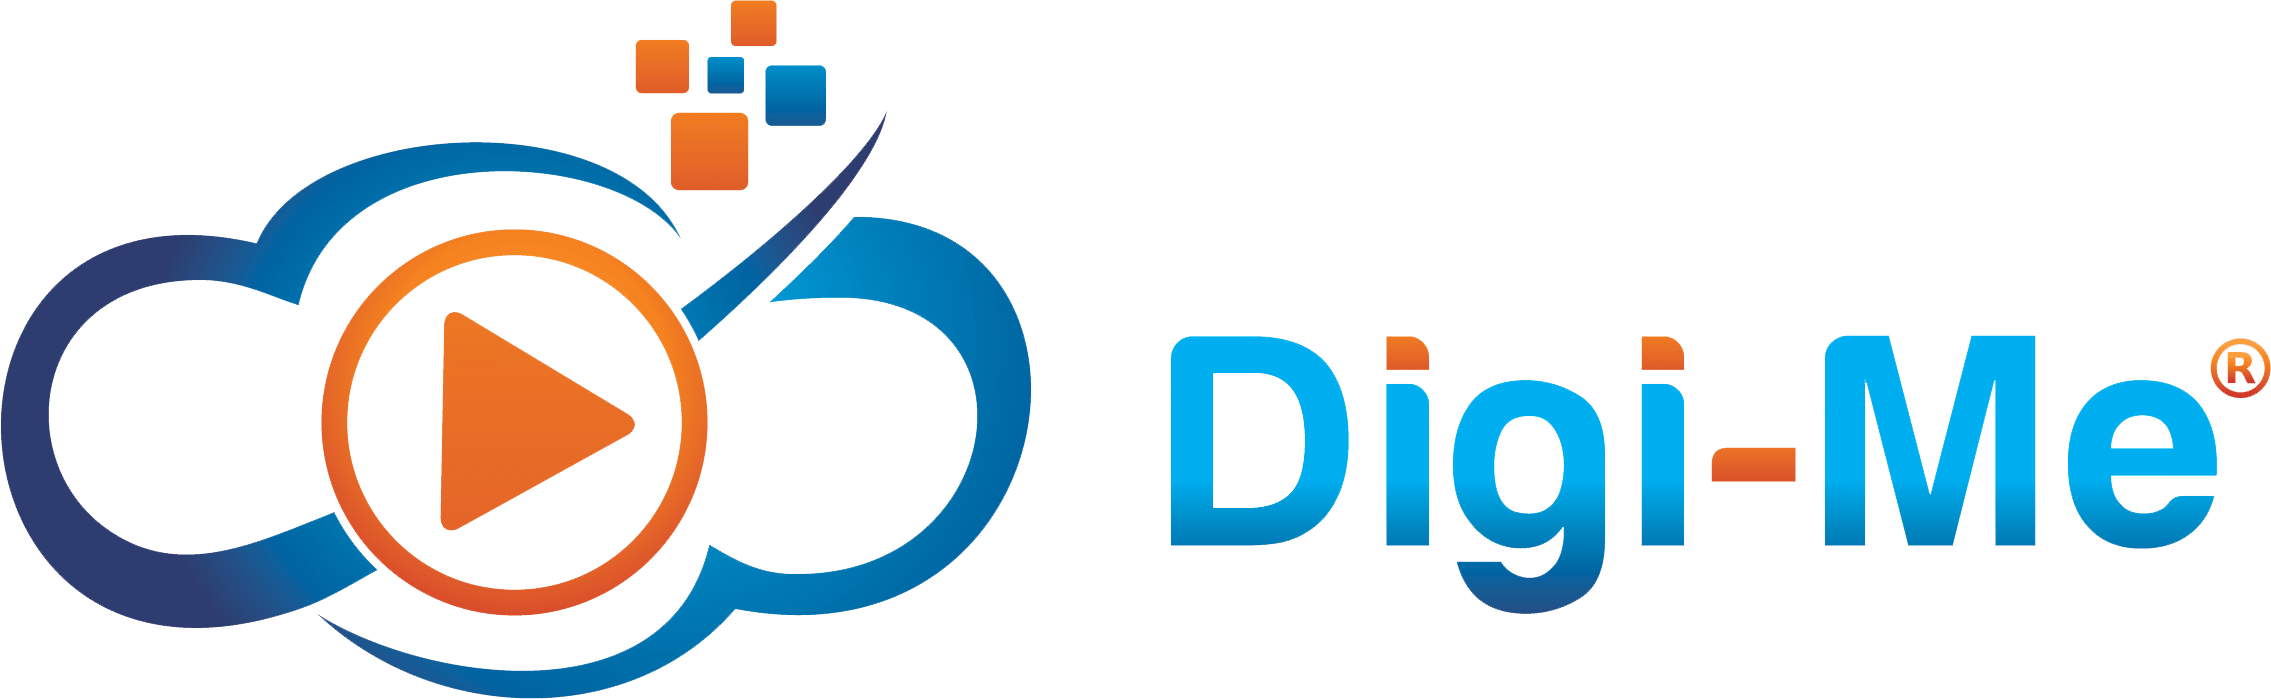 Digi-me Job Video Company Registered Logo in the Long Form